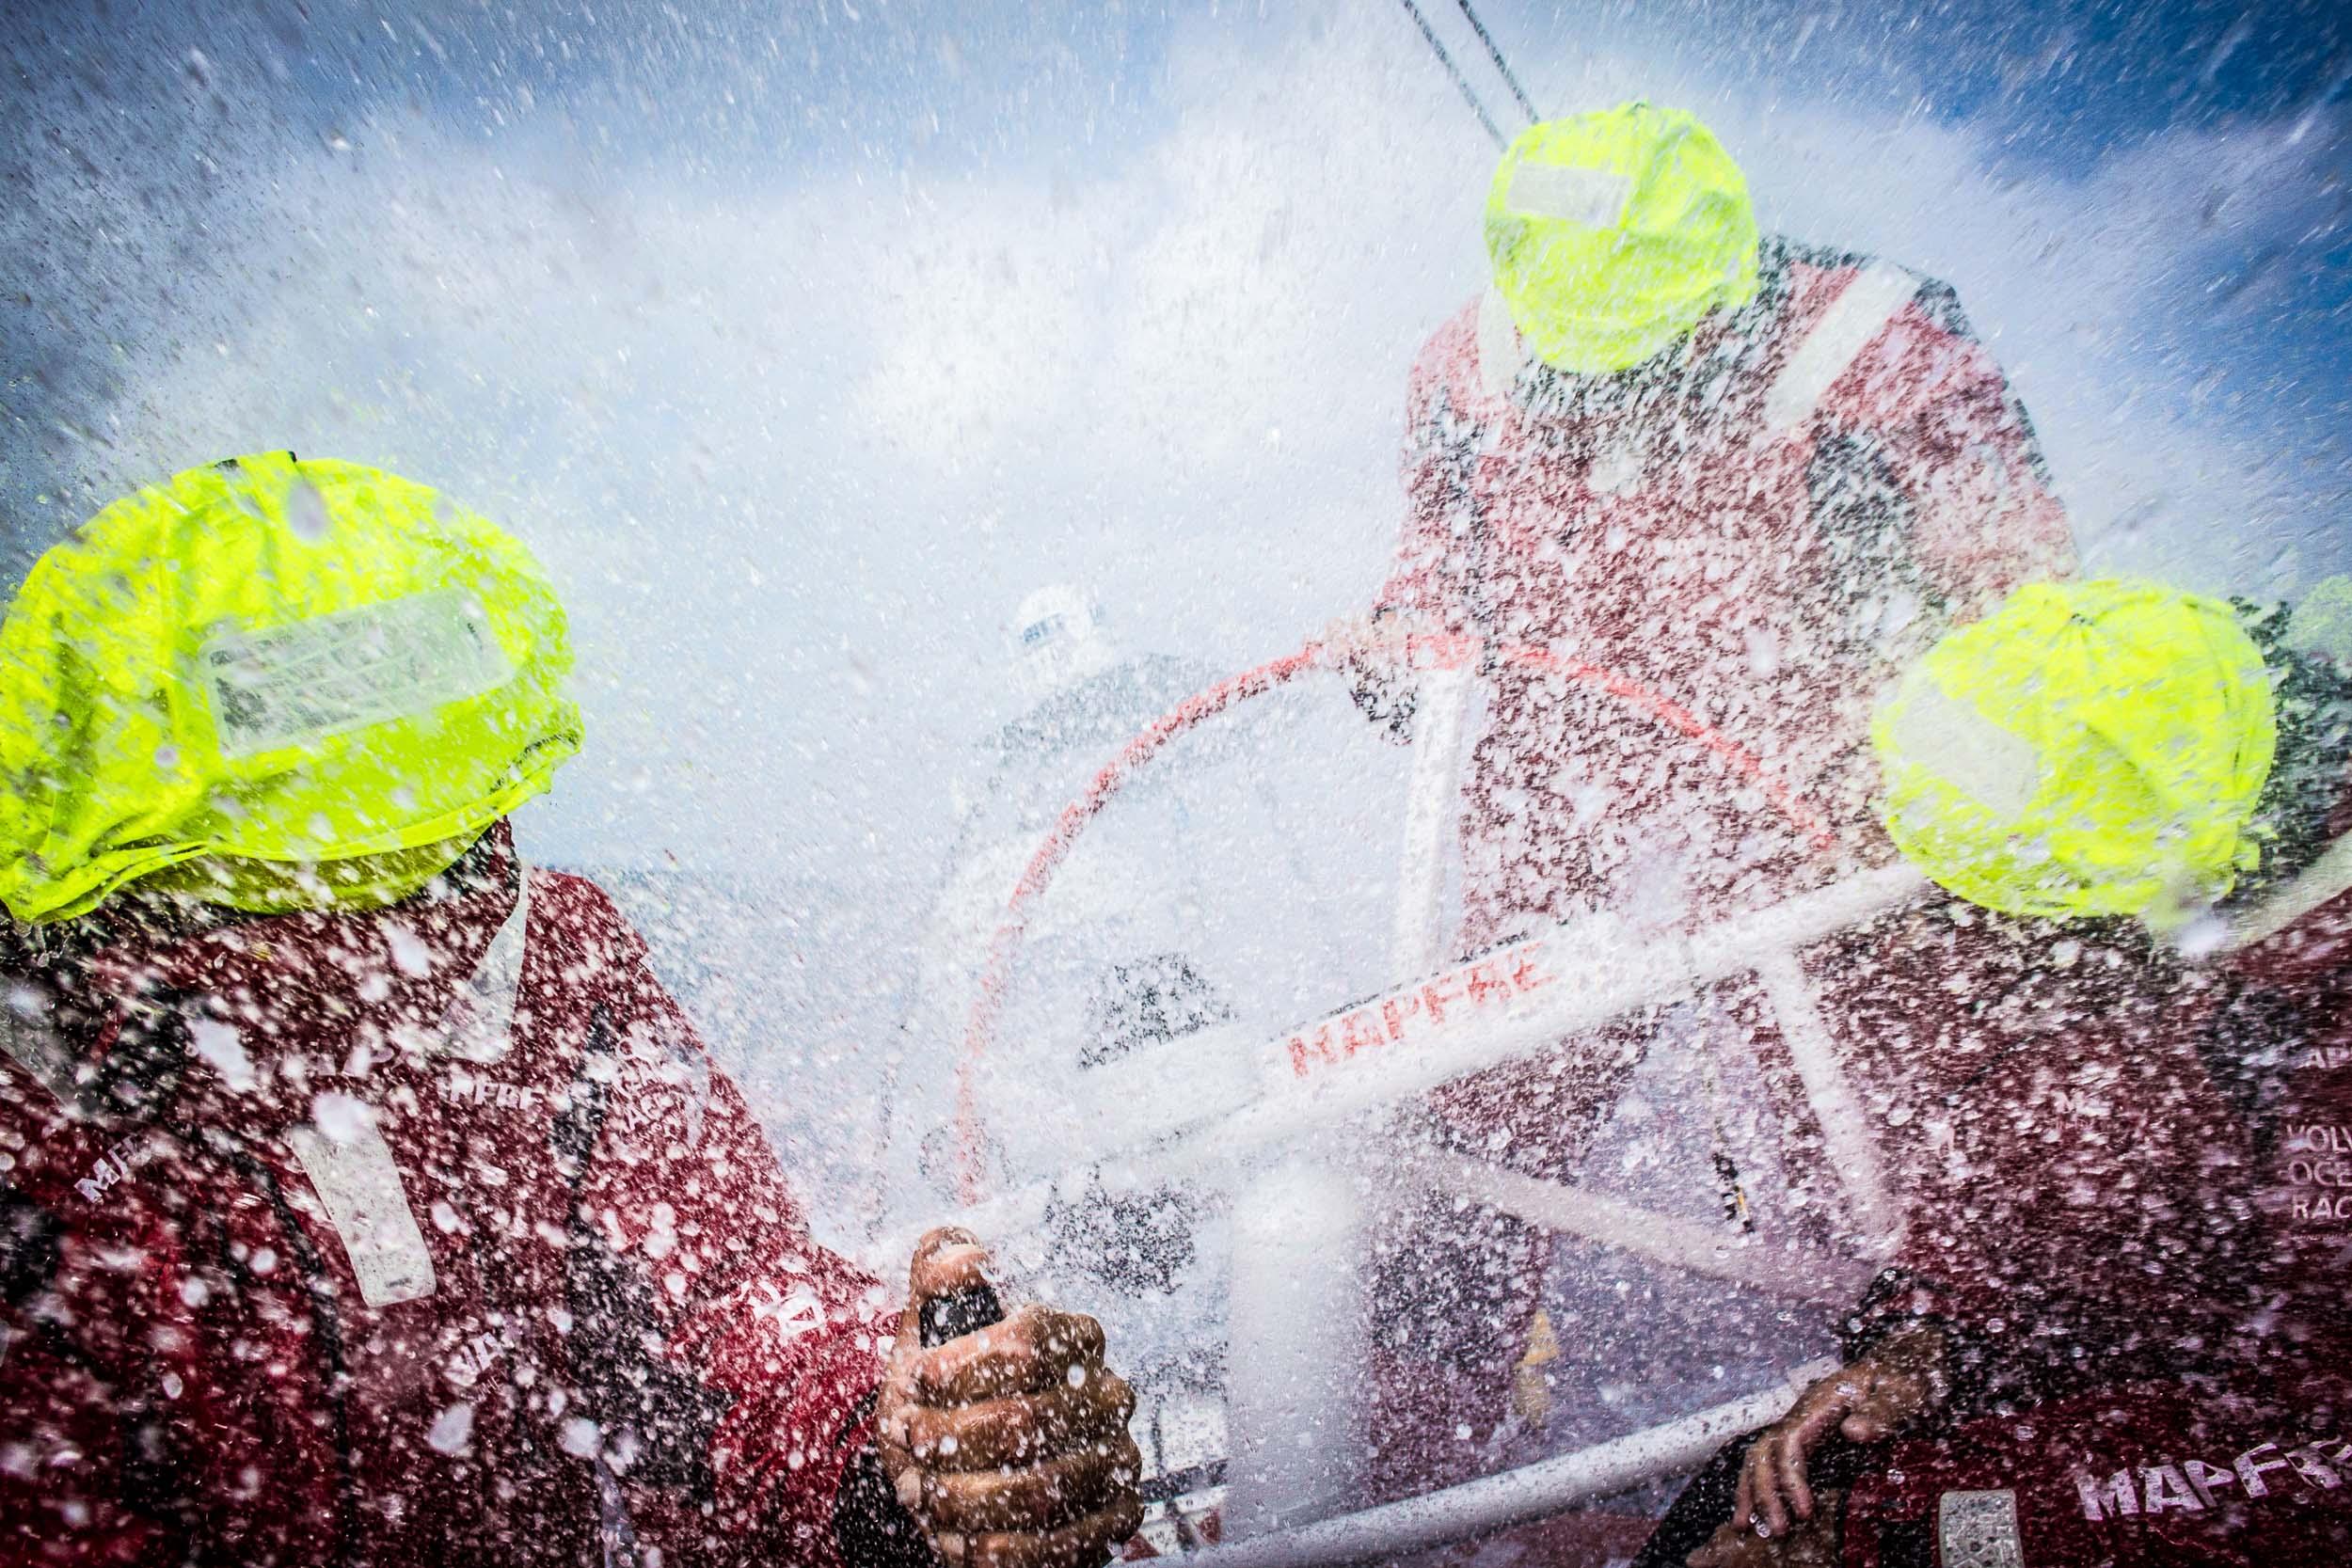 Volvo Ocean Race 2014 - 15 Leg 8 to Lorient